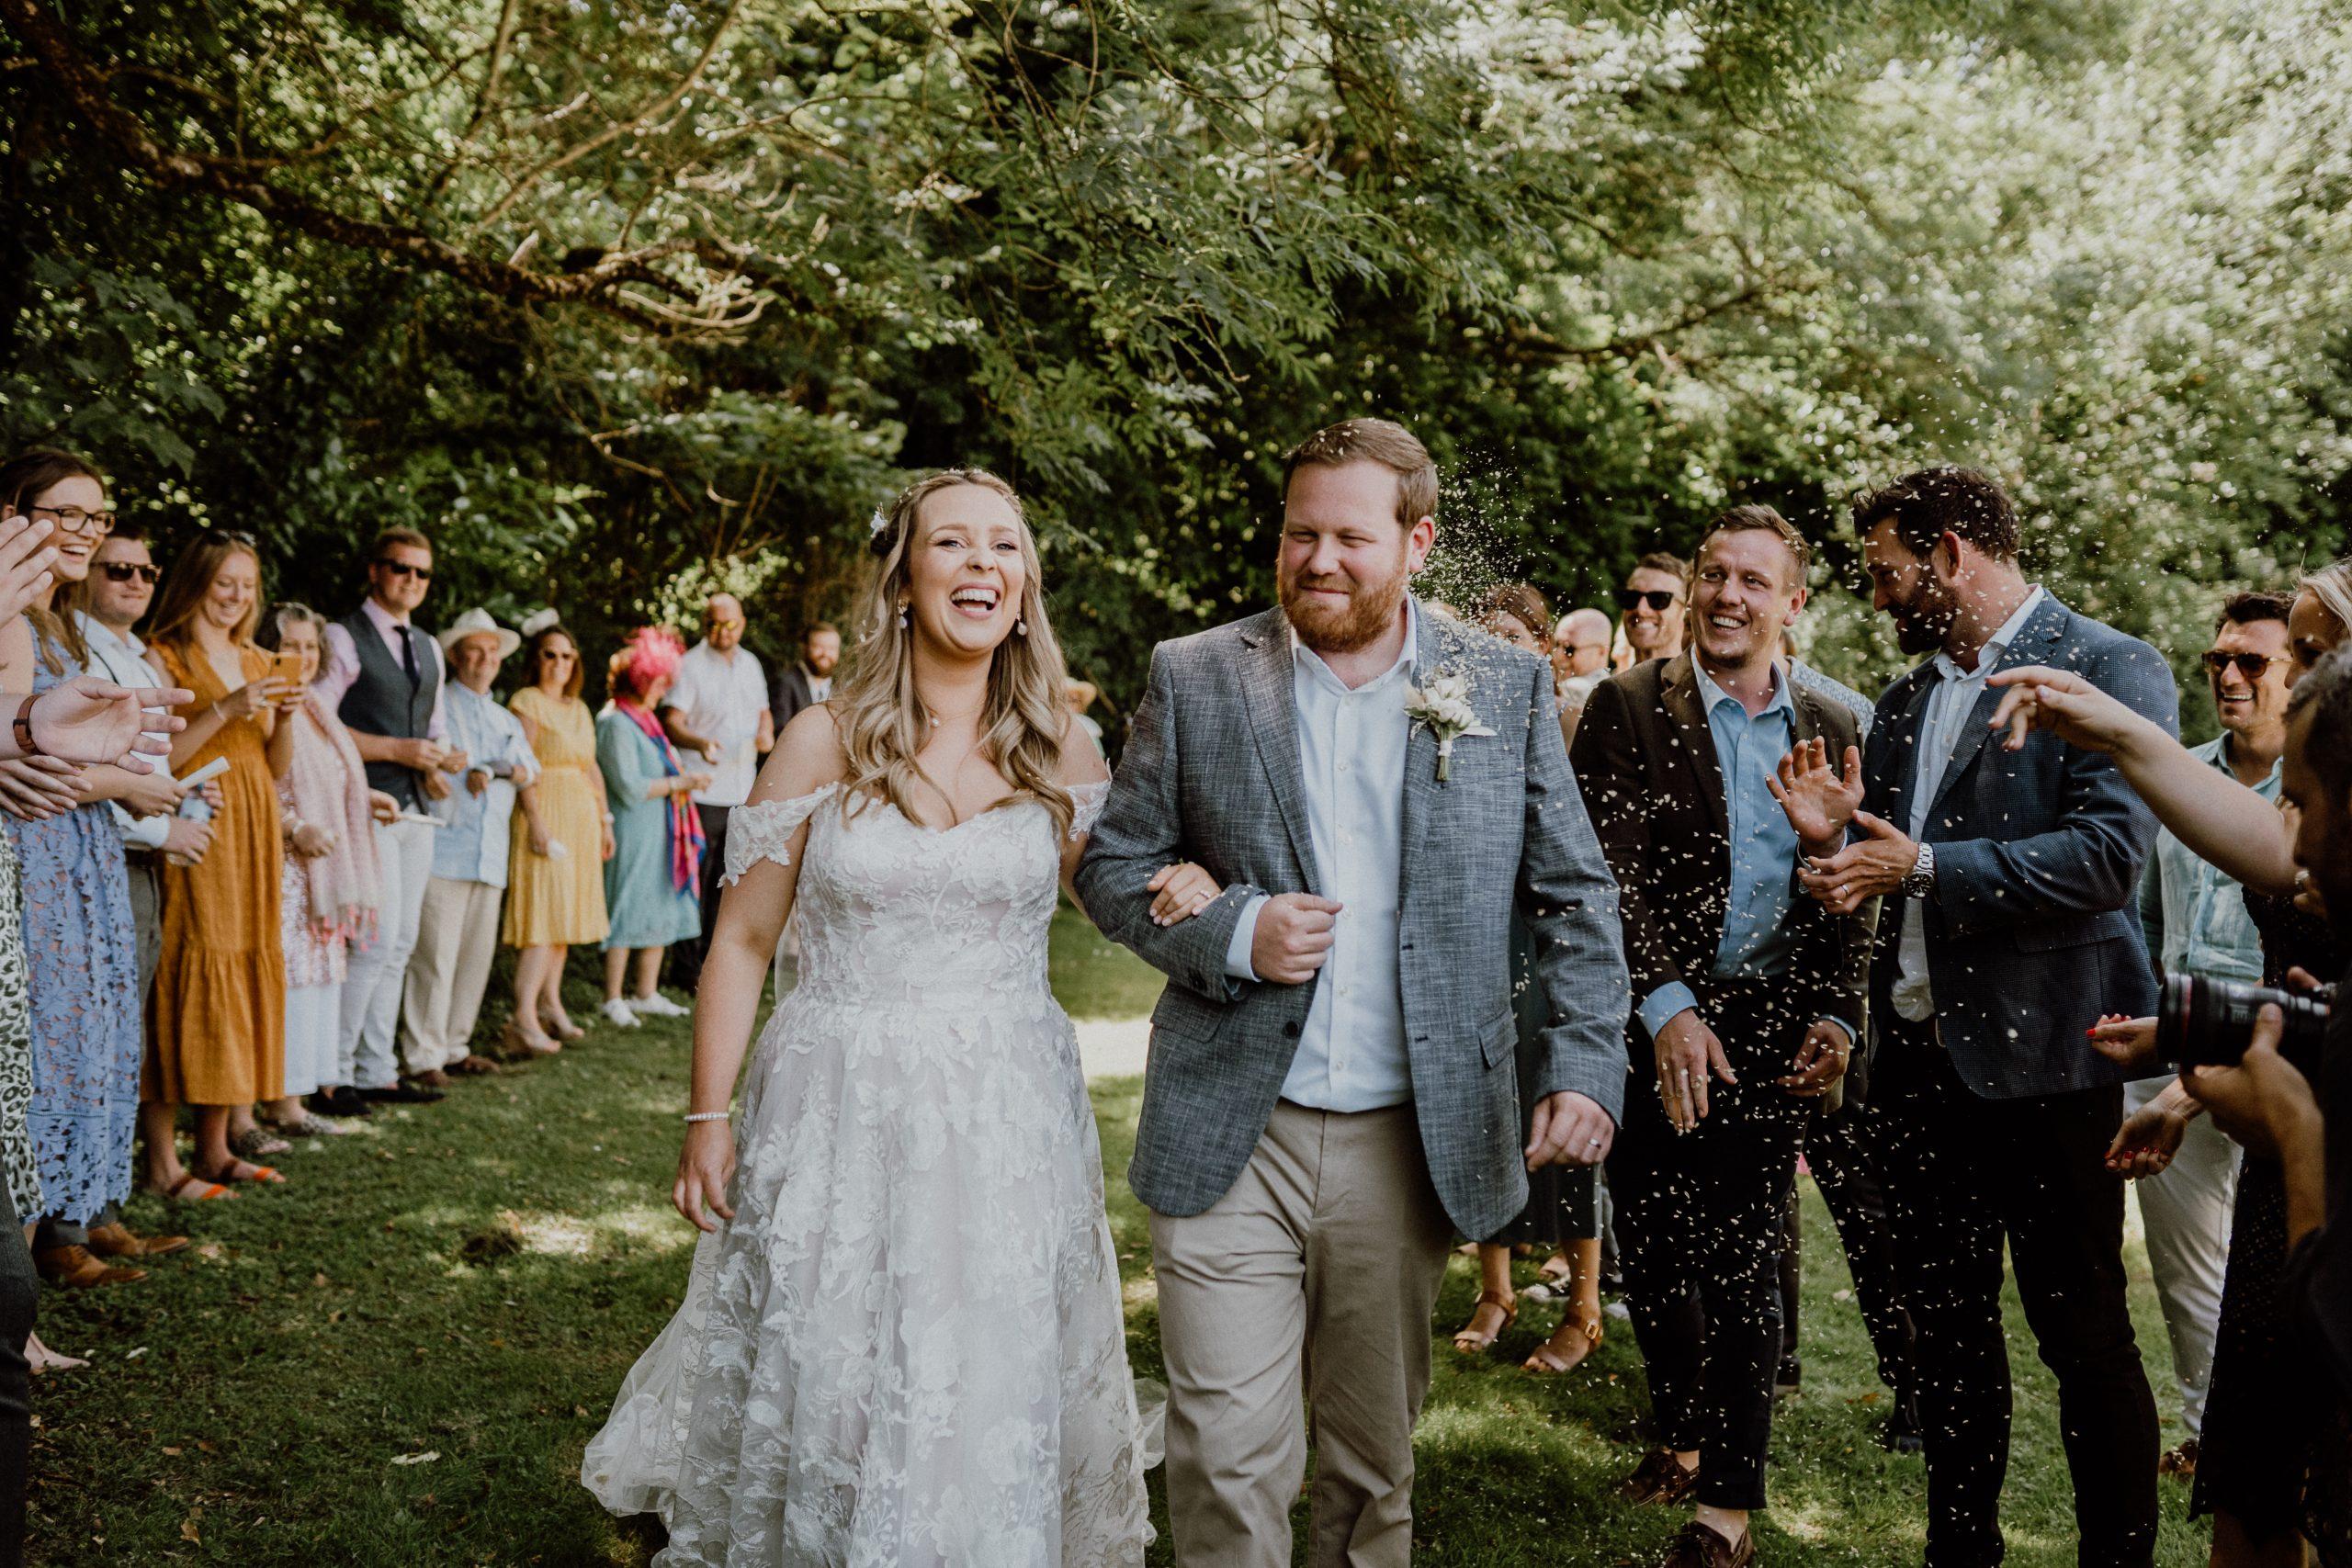 Wedding Celebrant - Confetti Throws - Congas - Kisses - Capturing the Joy